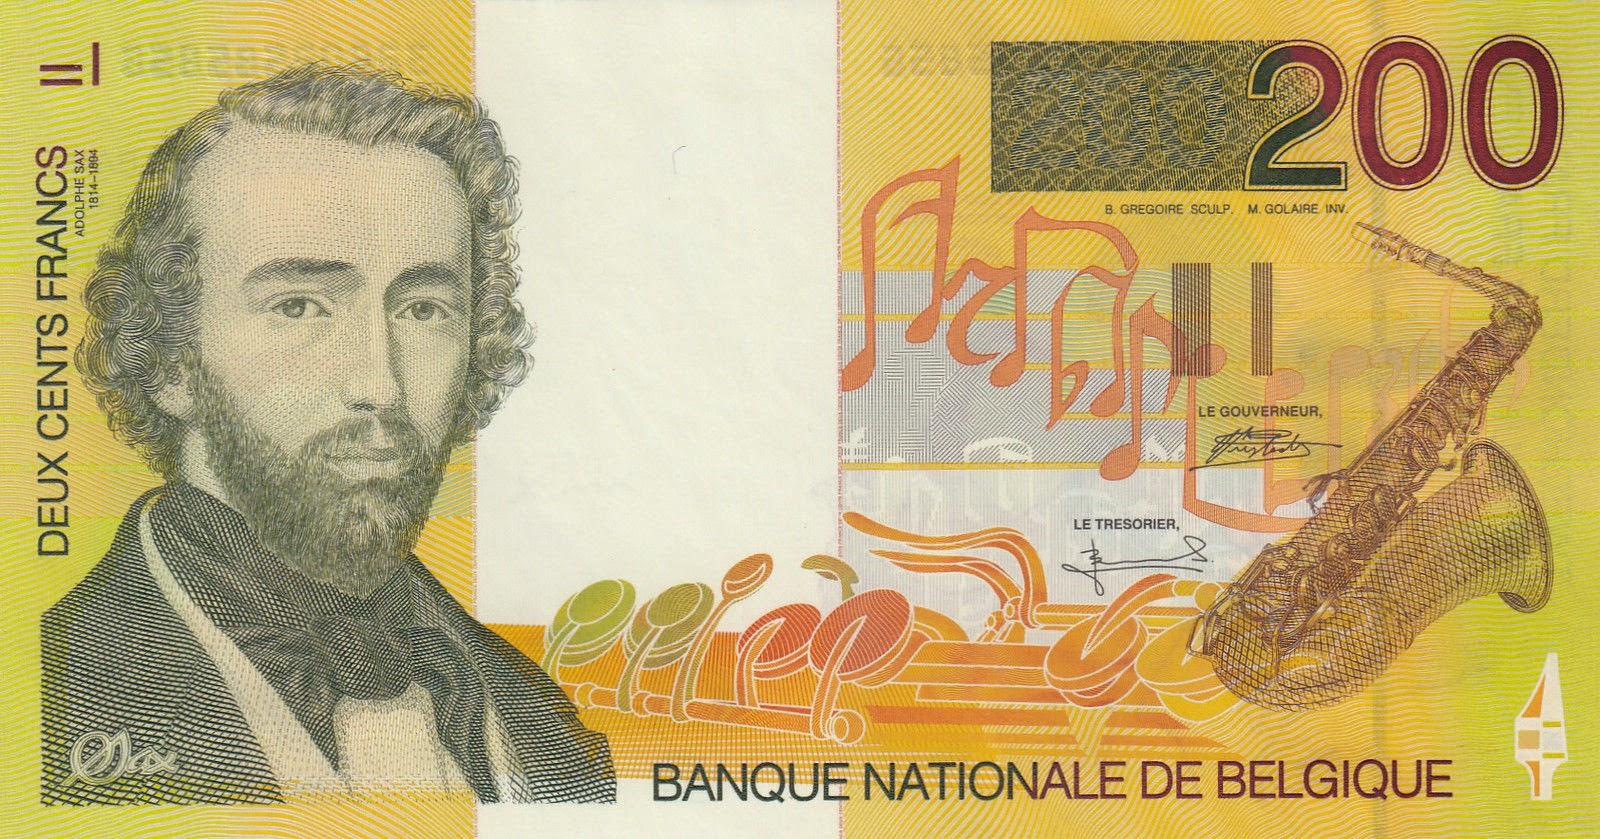 Belgium Banknotes 200 Belgian Francs banknote 1995 Adolphe Sax